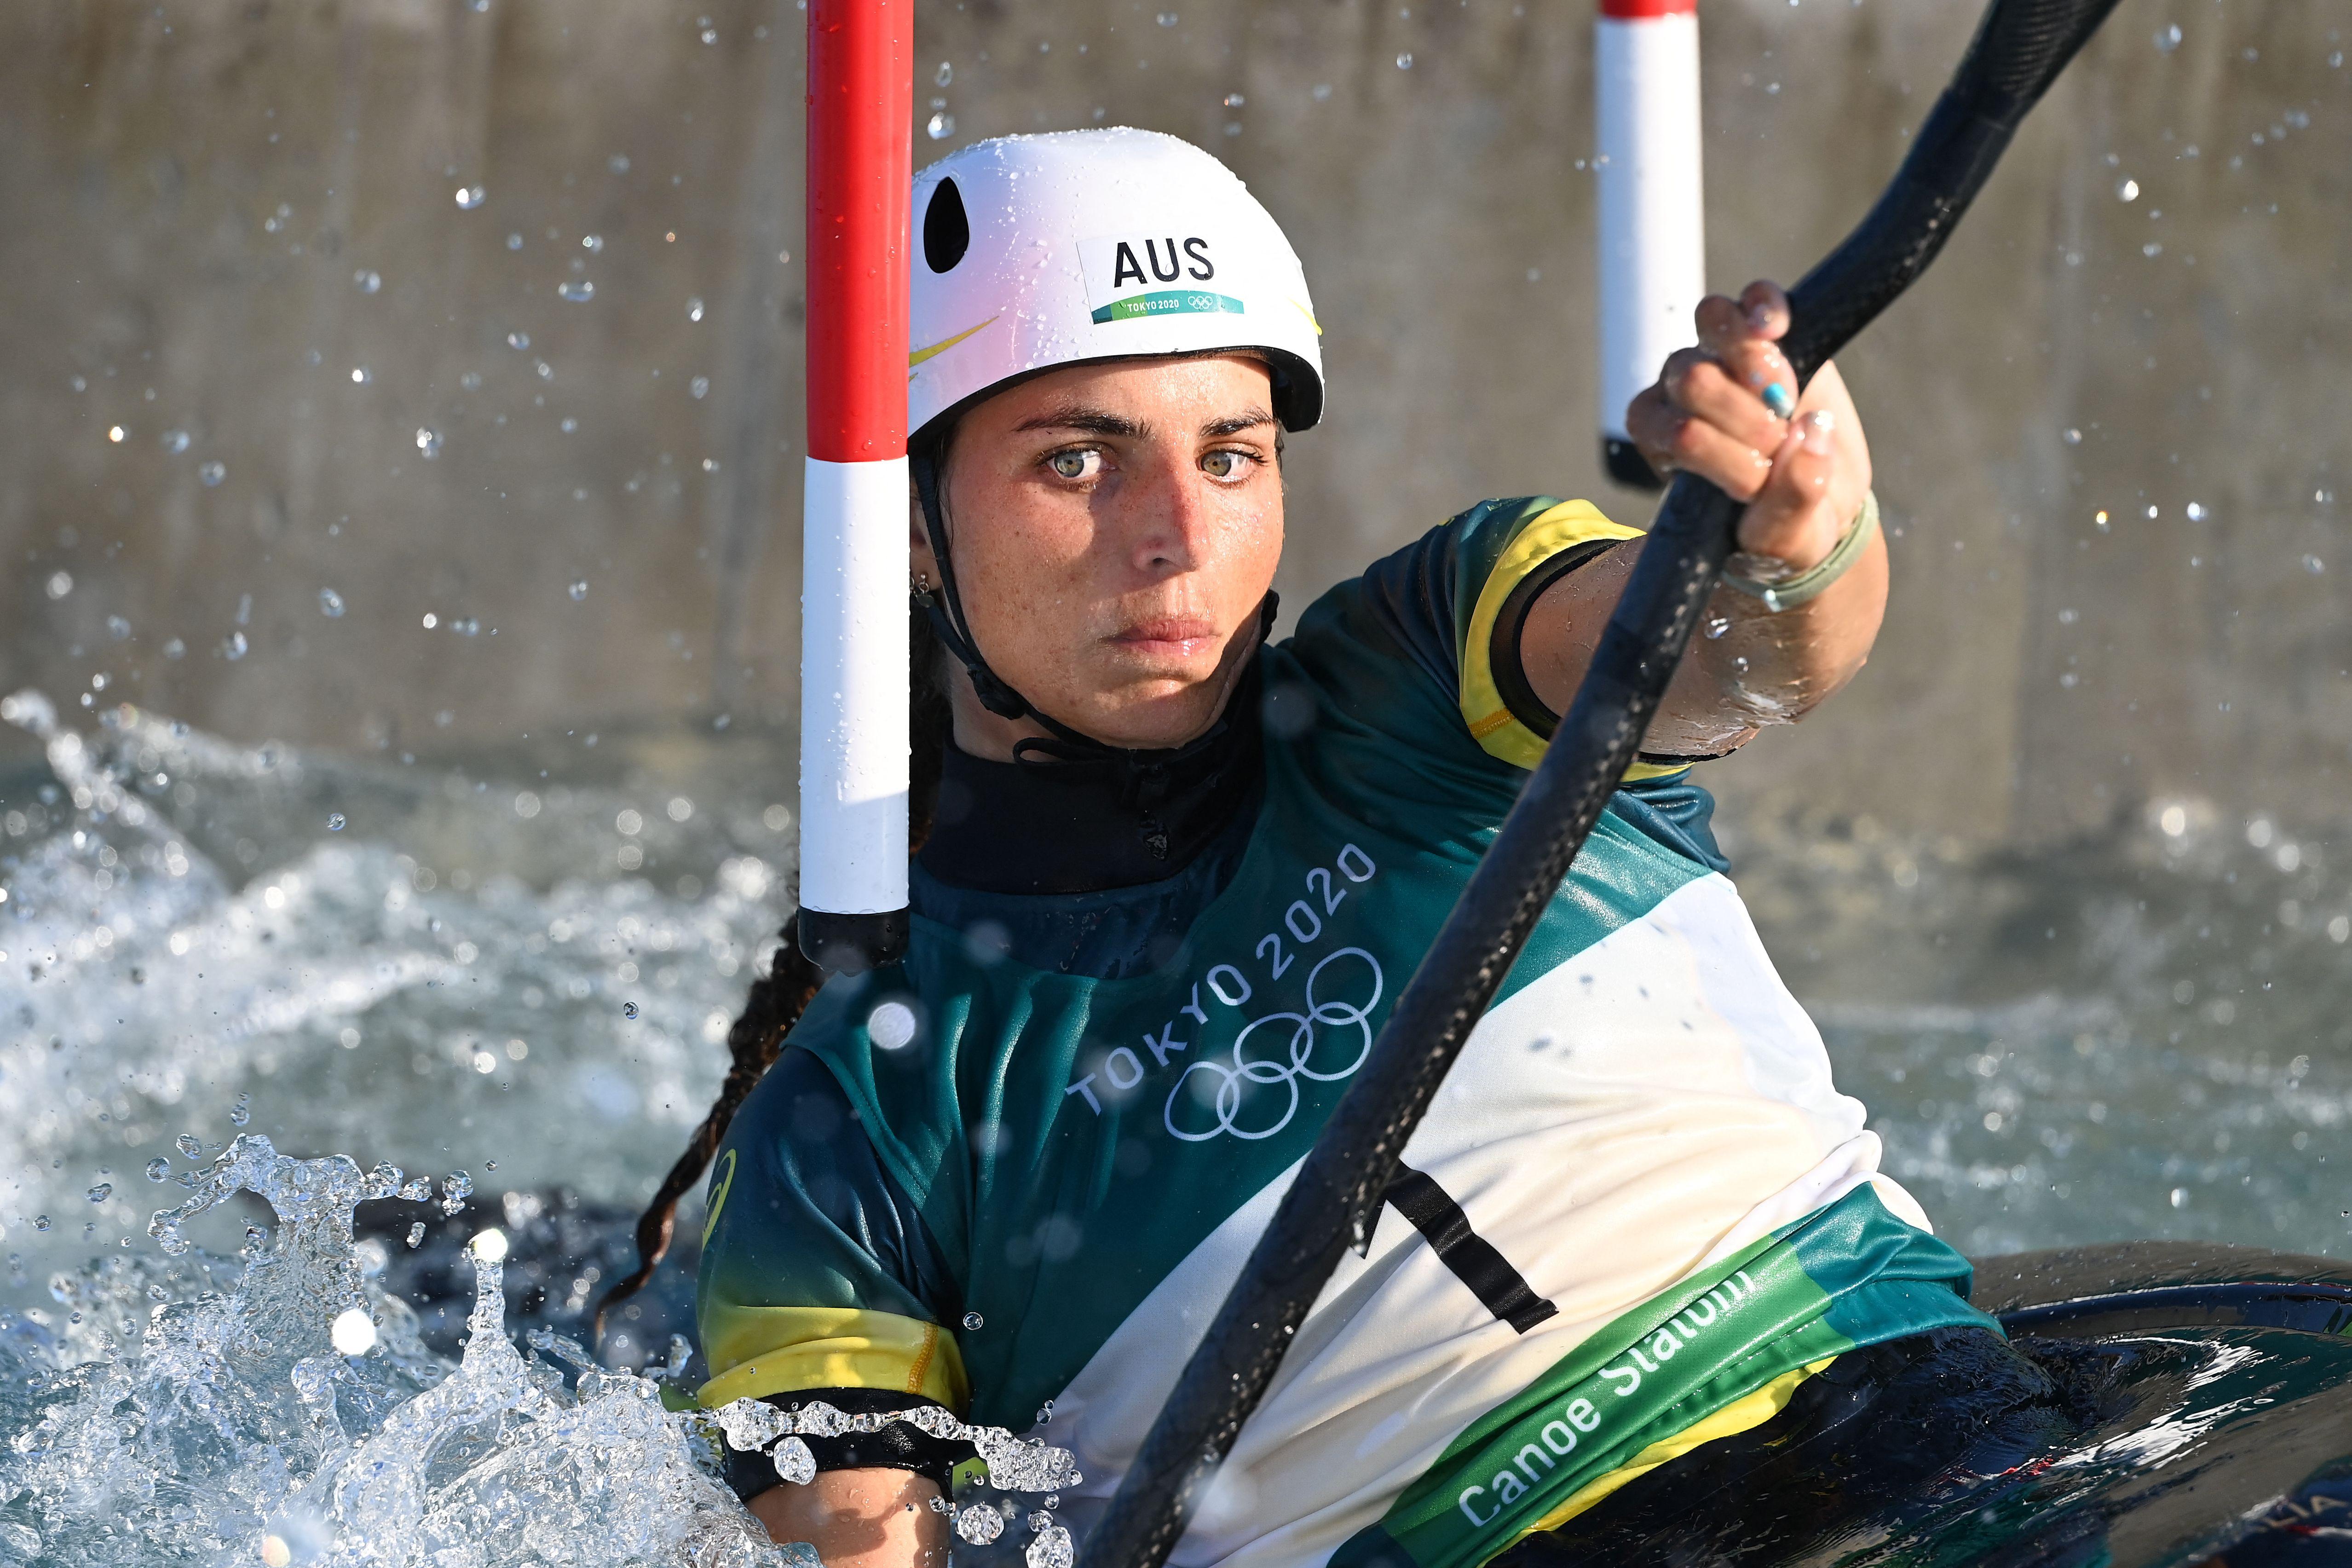 Jessica Fox competes in the women's kayak heats on Sunday.